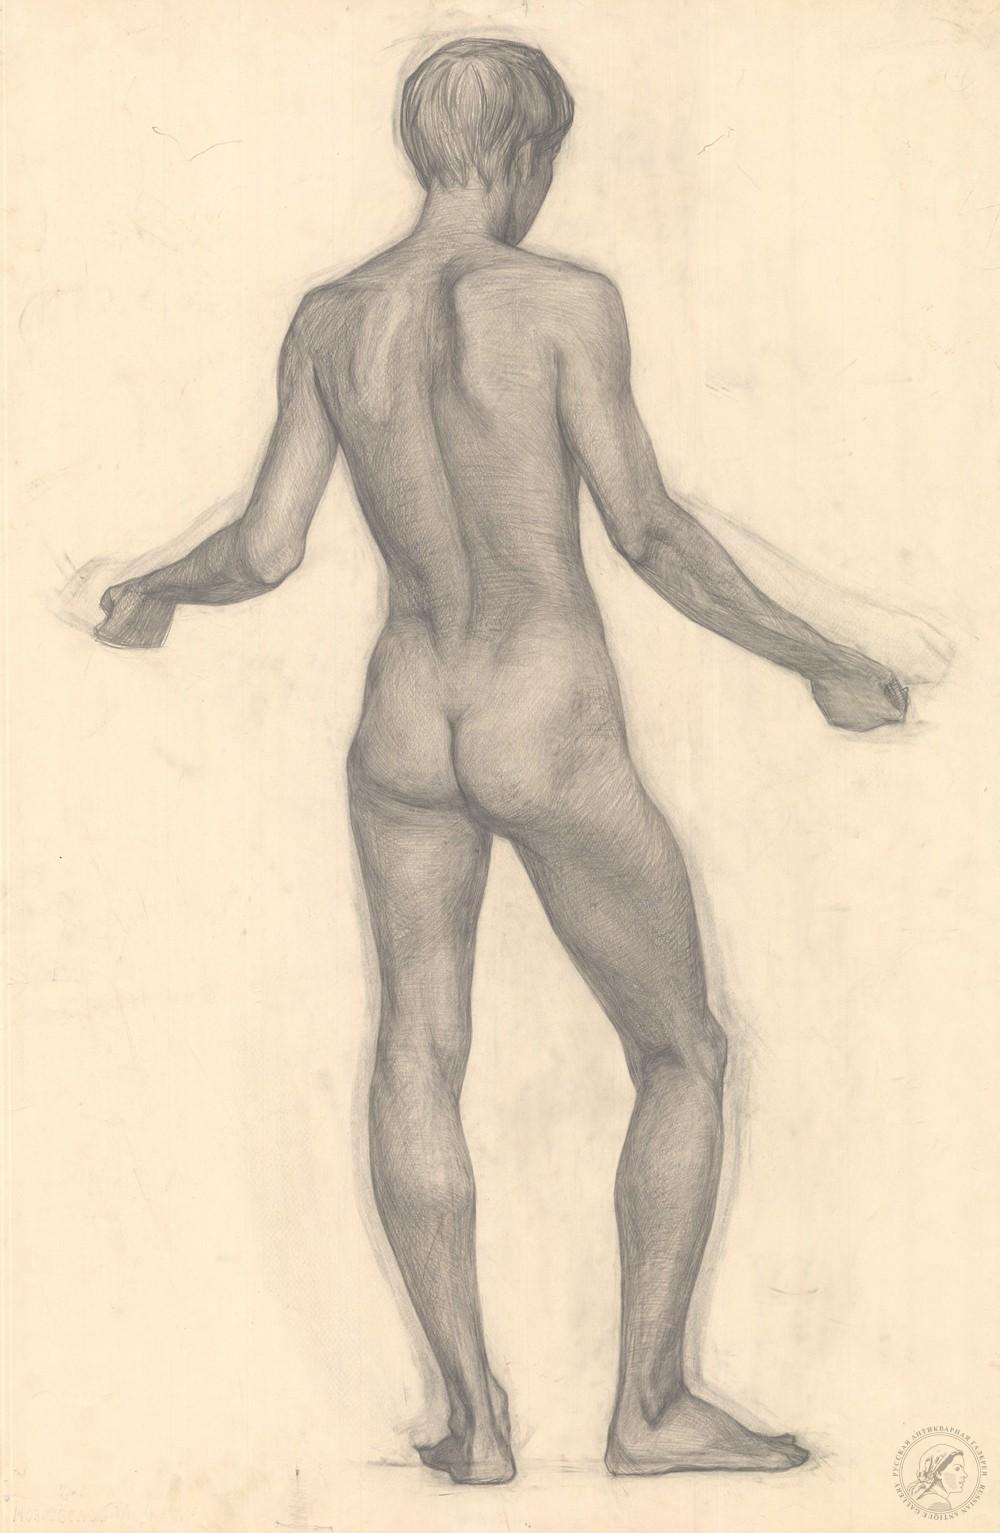 Рисунок «Эскиз мужской фигуры»